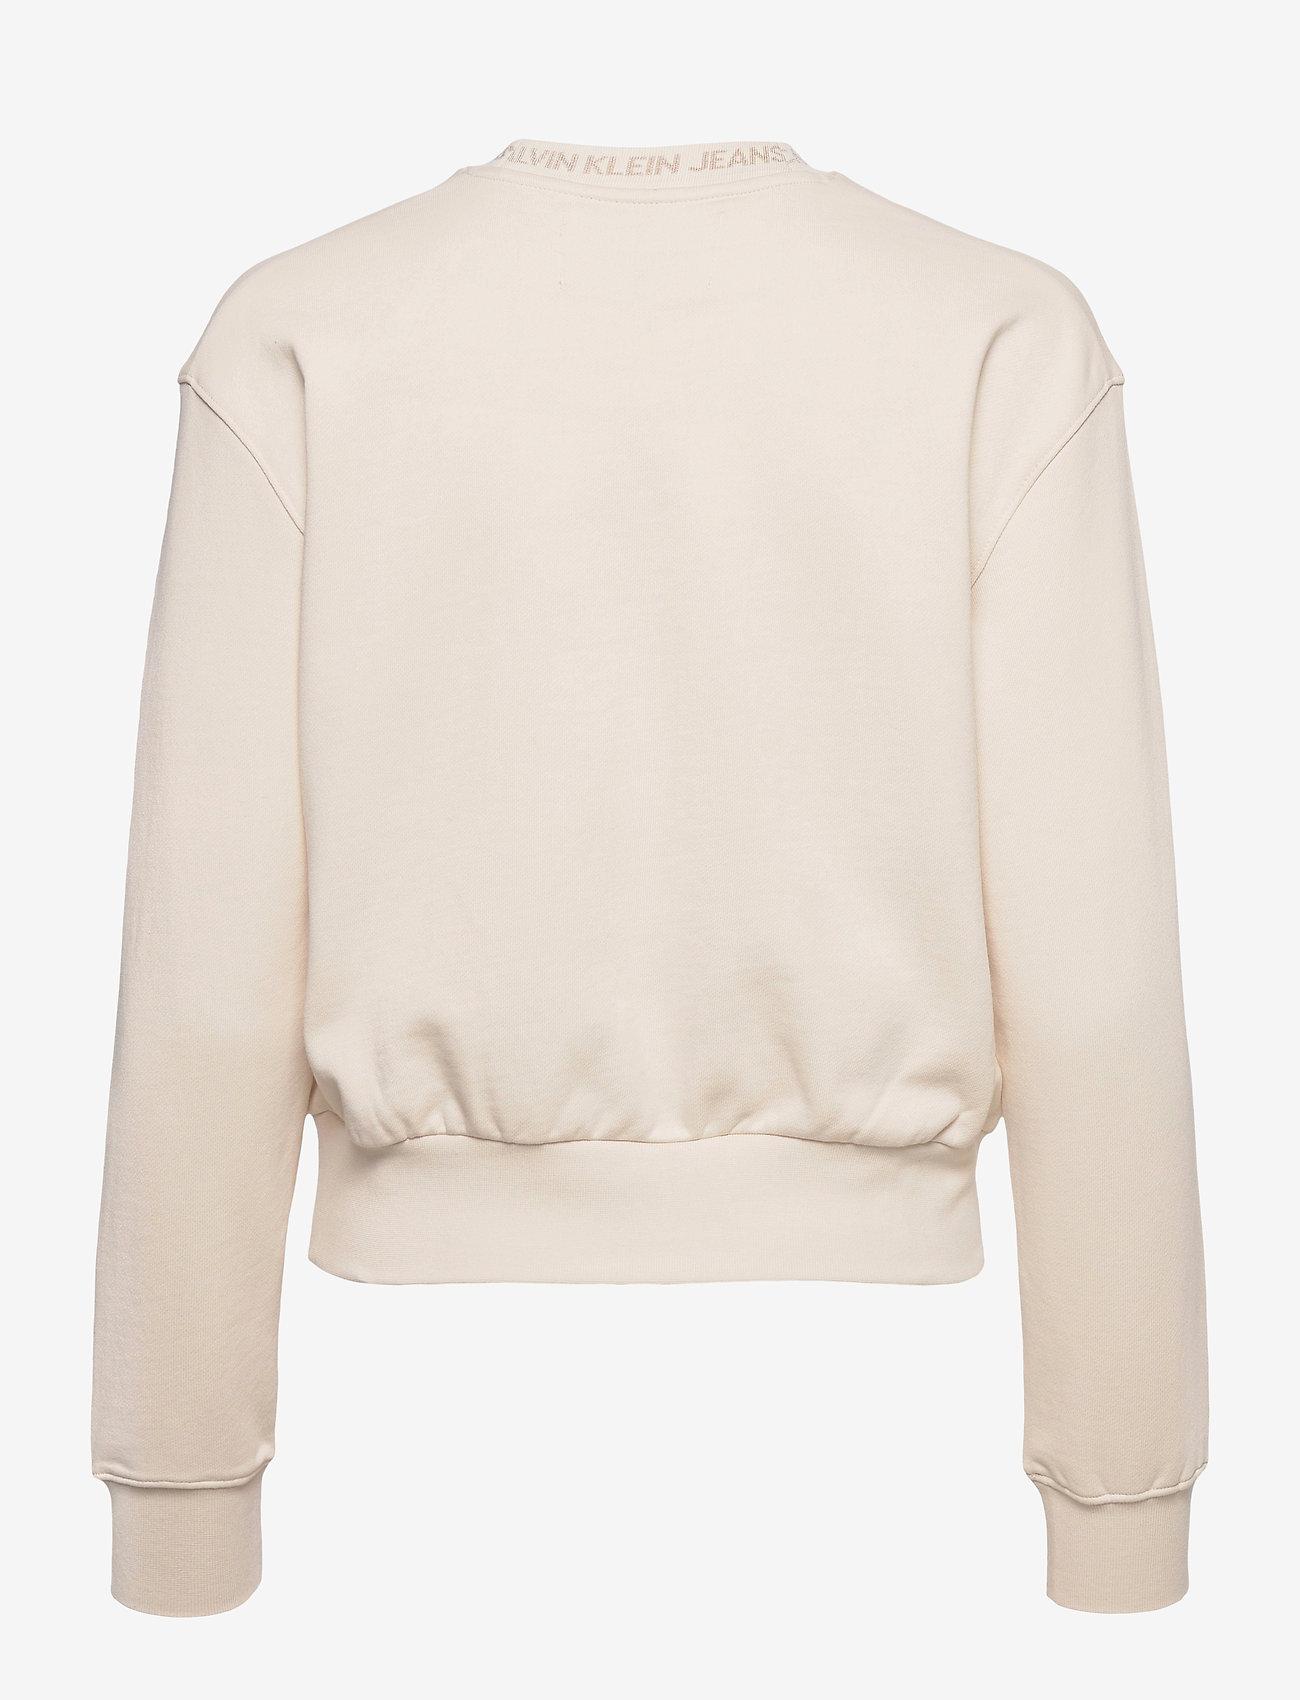 Calvin Klein Jeans - LOGO TRIM CREW NECK SWEATSHIRT - gensere og hettegensere - white sand - 1